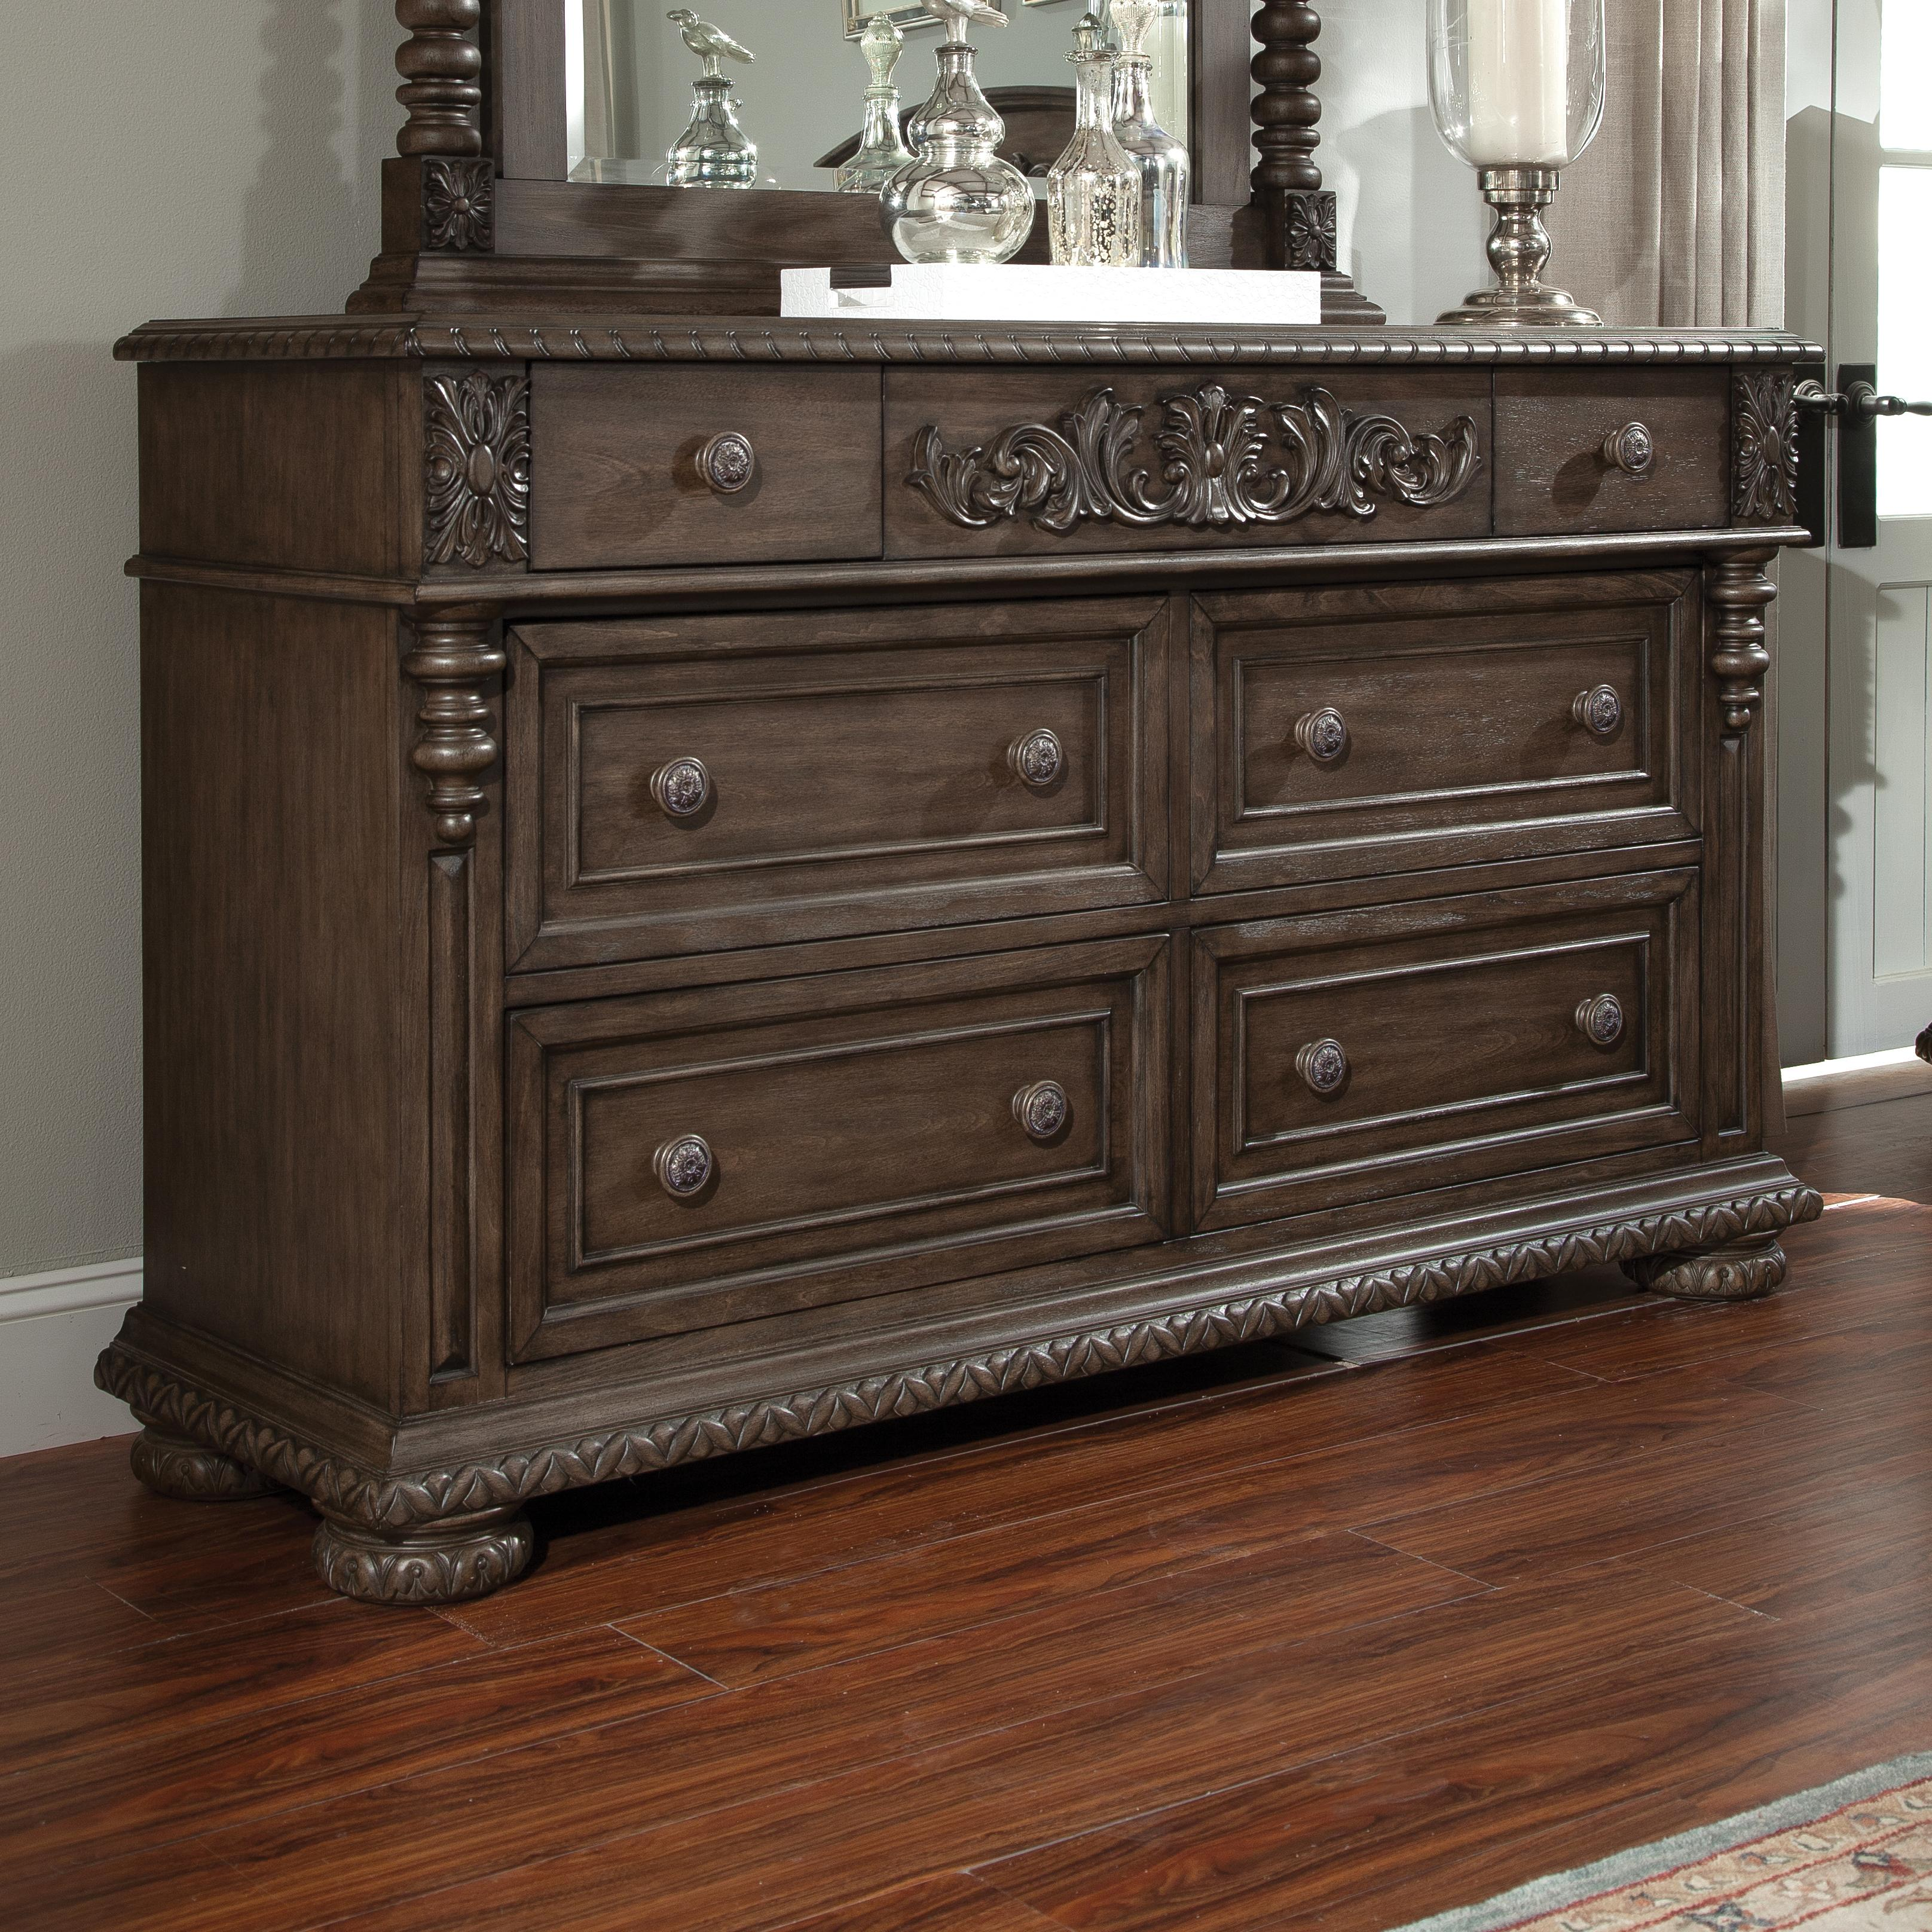 Belfort Basics Virginia Manor Dresser - Item Number: 980-650 DRES